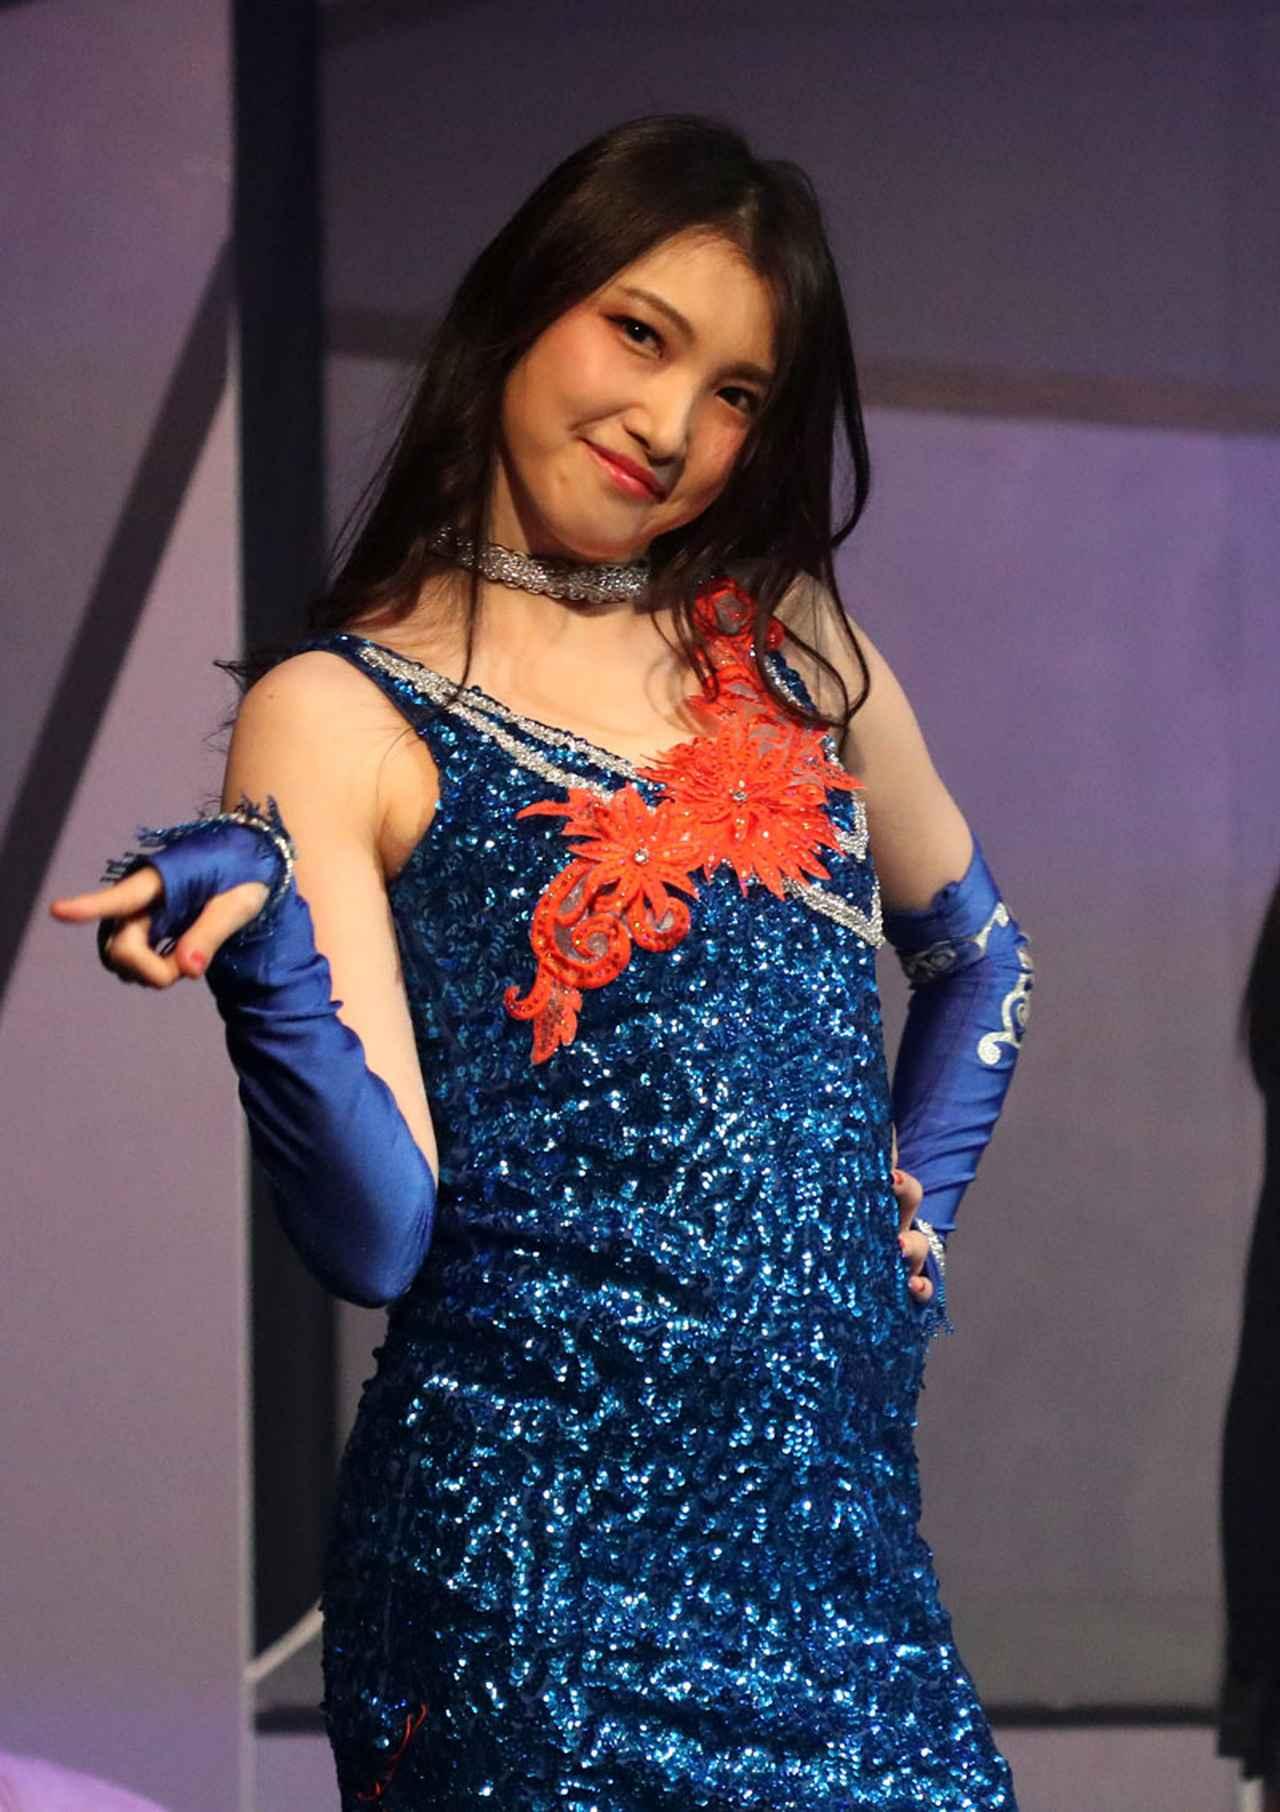 Images : 26番目の画像 - 「横島亜衿、あわつまい/アリスインプロジェクト最新舞台「Dance!Dance!Dance!オルタナティブ」、ダンスフォースも満載に上演開始」のアルバム - Stereo Sound ONLINE